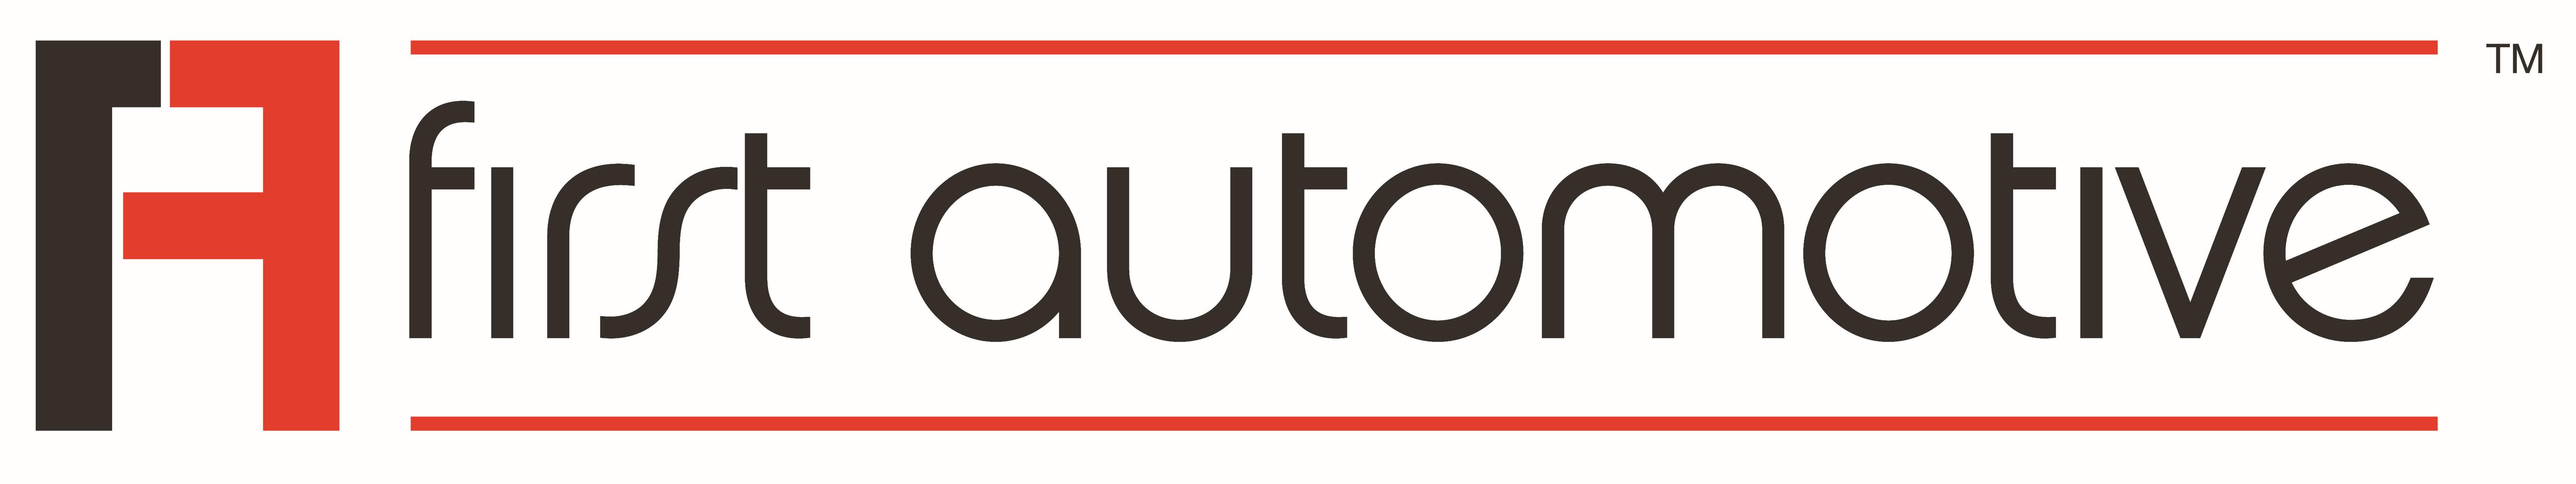 NDR -Logo First-Automotive_intero_JPG